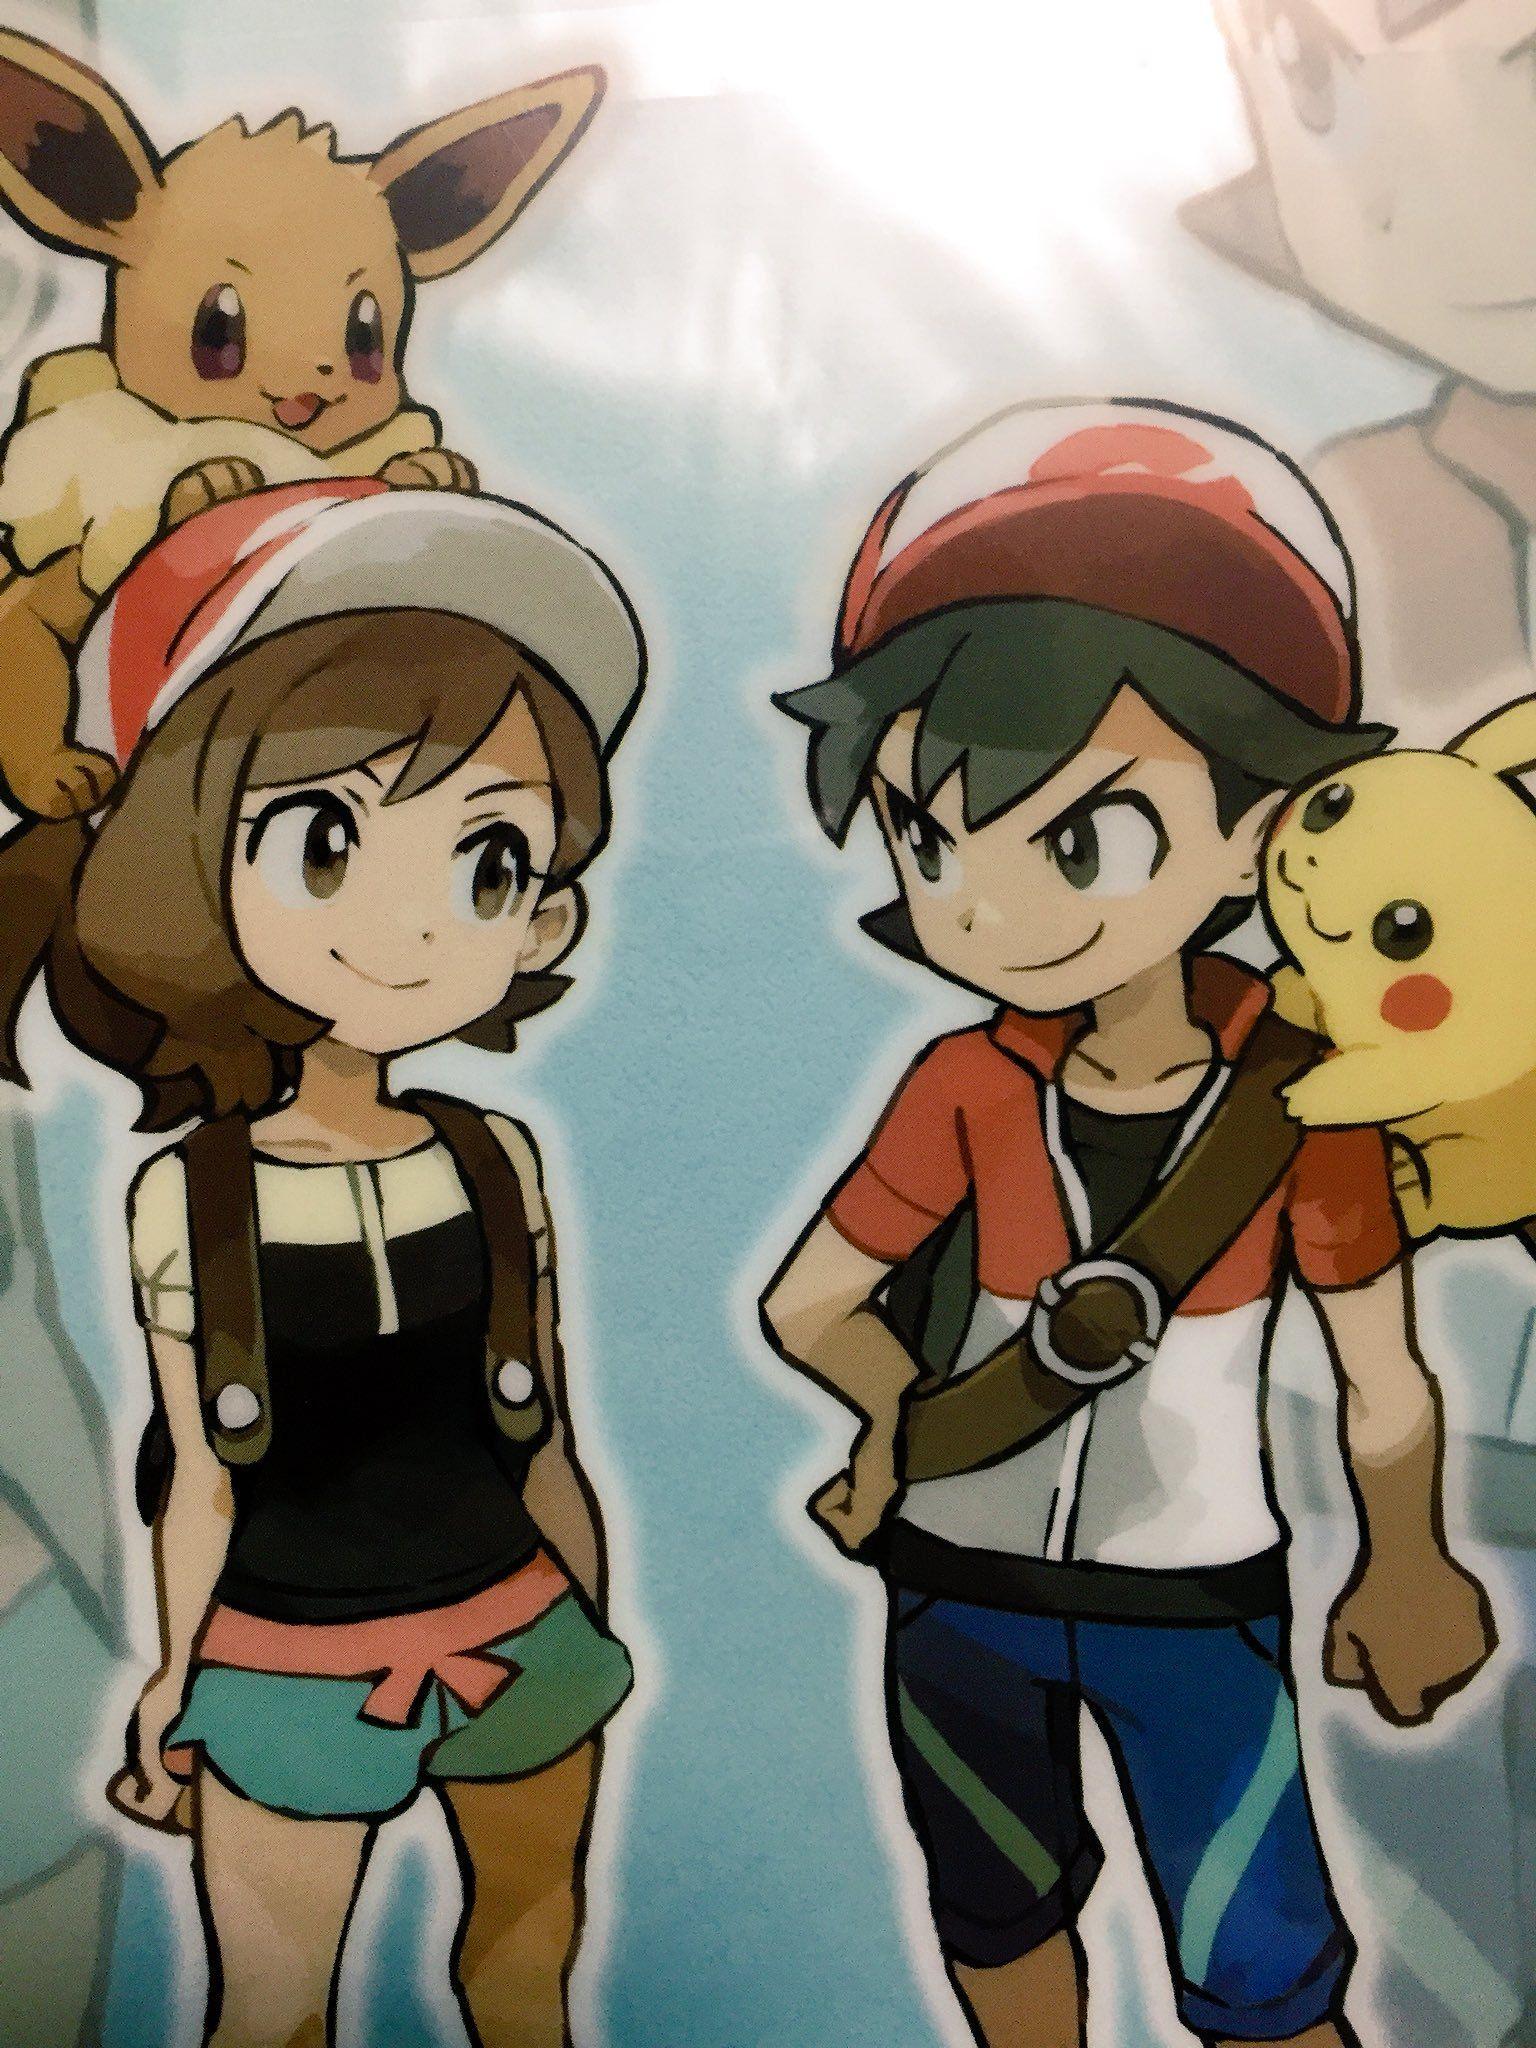 Pkmn Let S Go Kanto S New Trainers Pokemon Game Characters Pokemon Characters Cute Pokemon